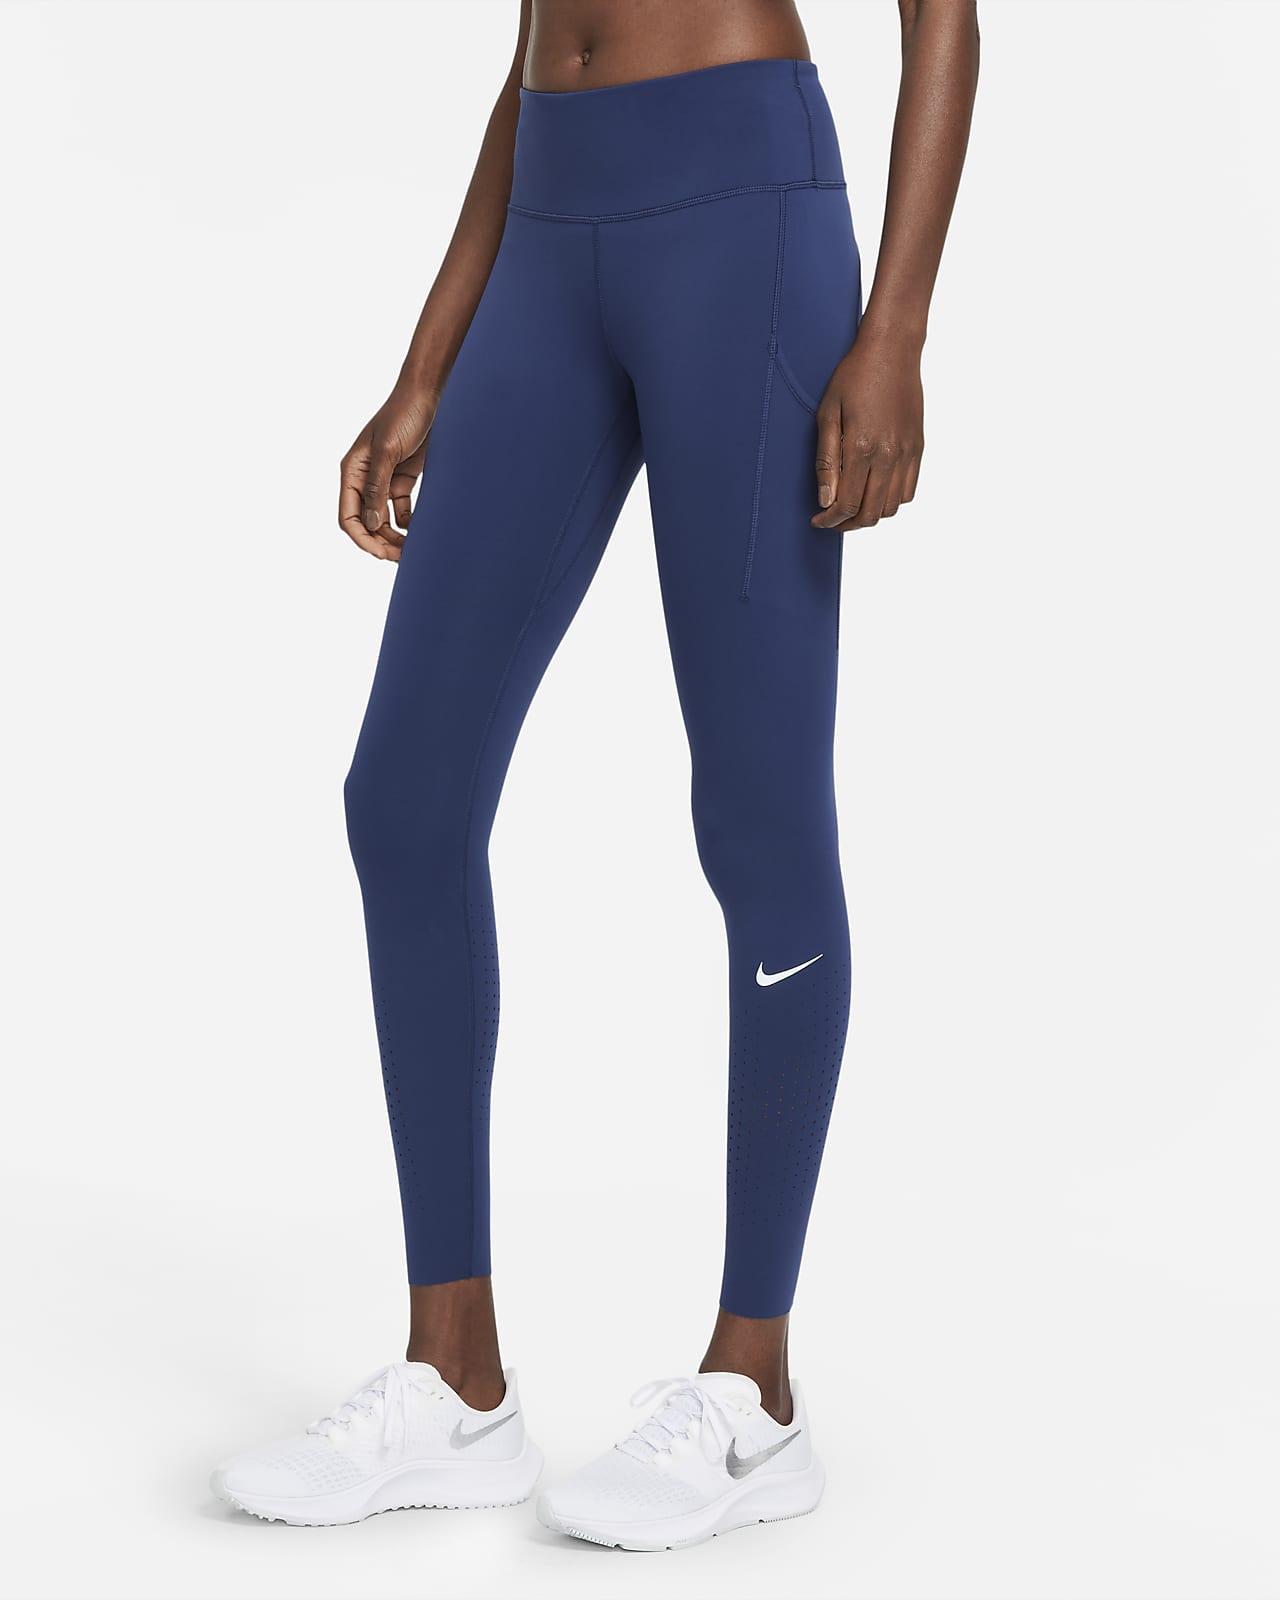 Nike Epic Luxe Hardlooplegging met halfhoge taille voor dames